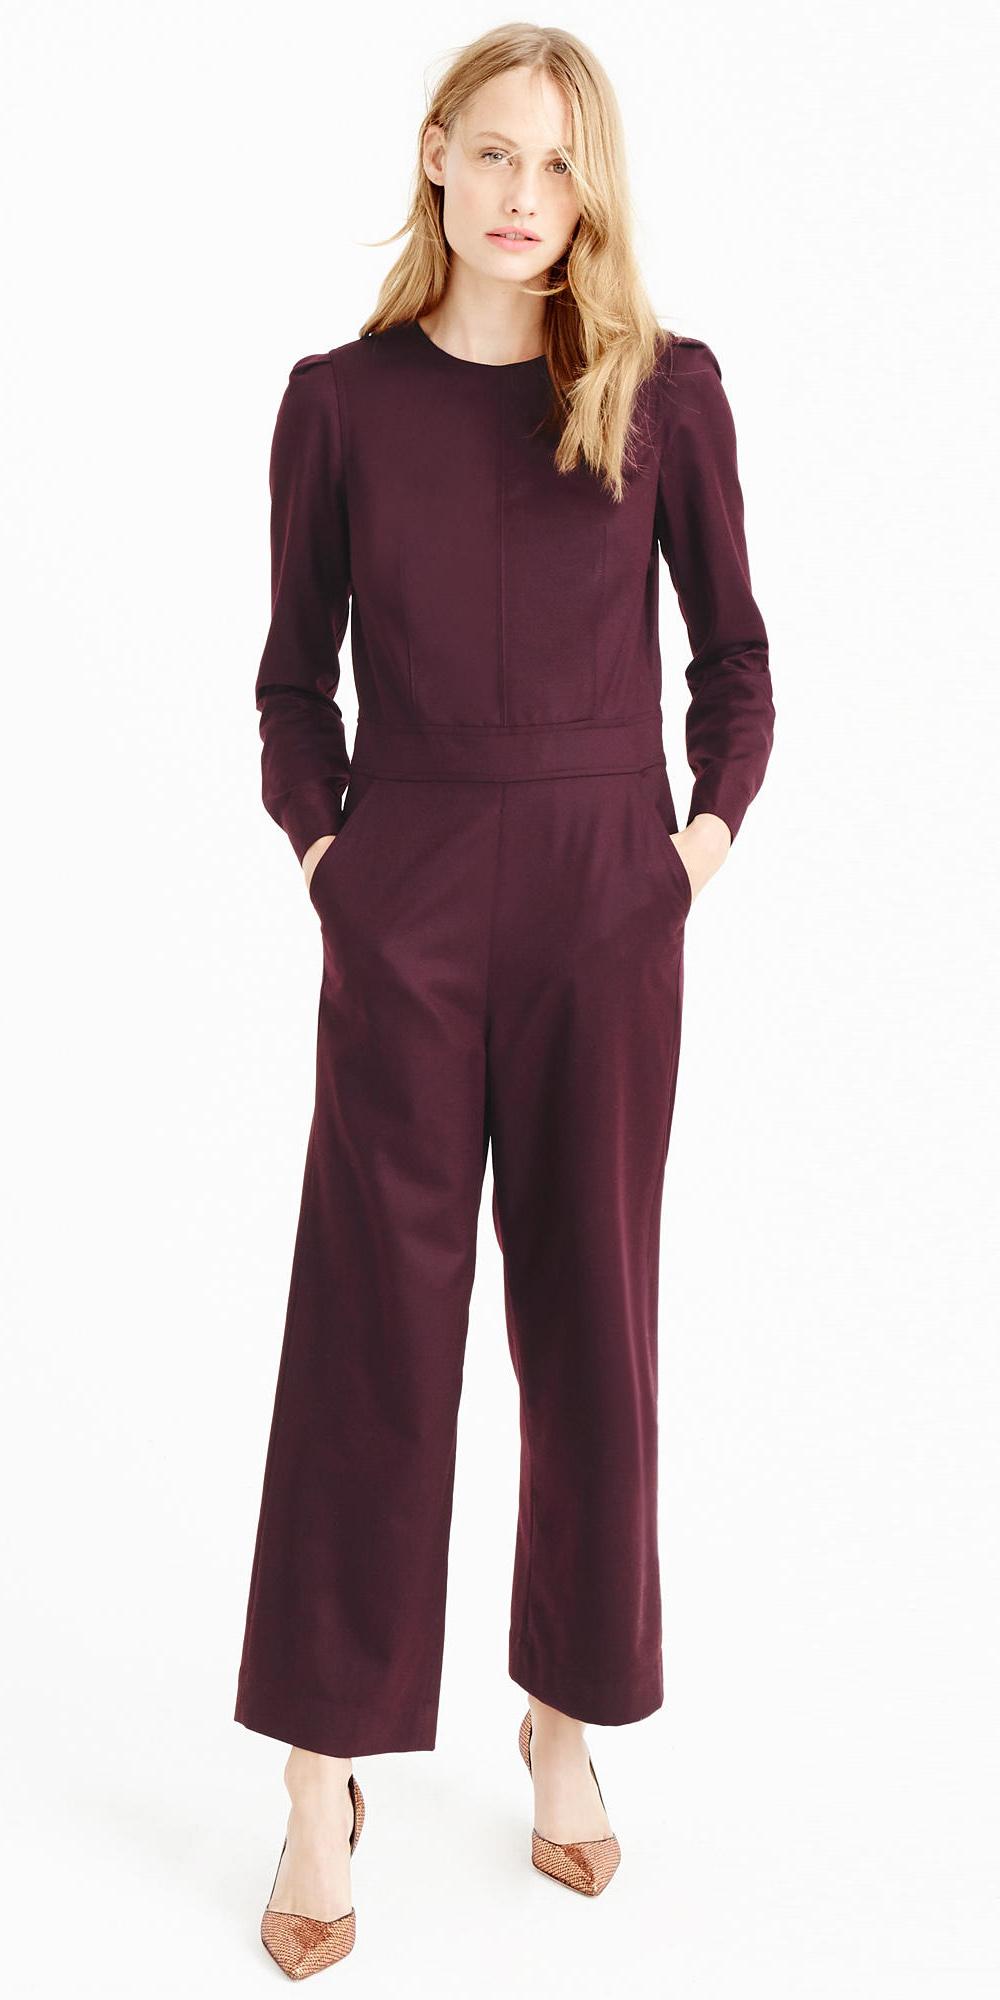 burgundy-jumpsuit-howtowear-fall-winter-blonde-work.jpeg